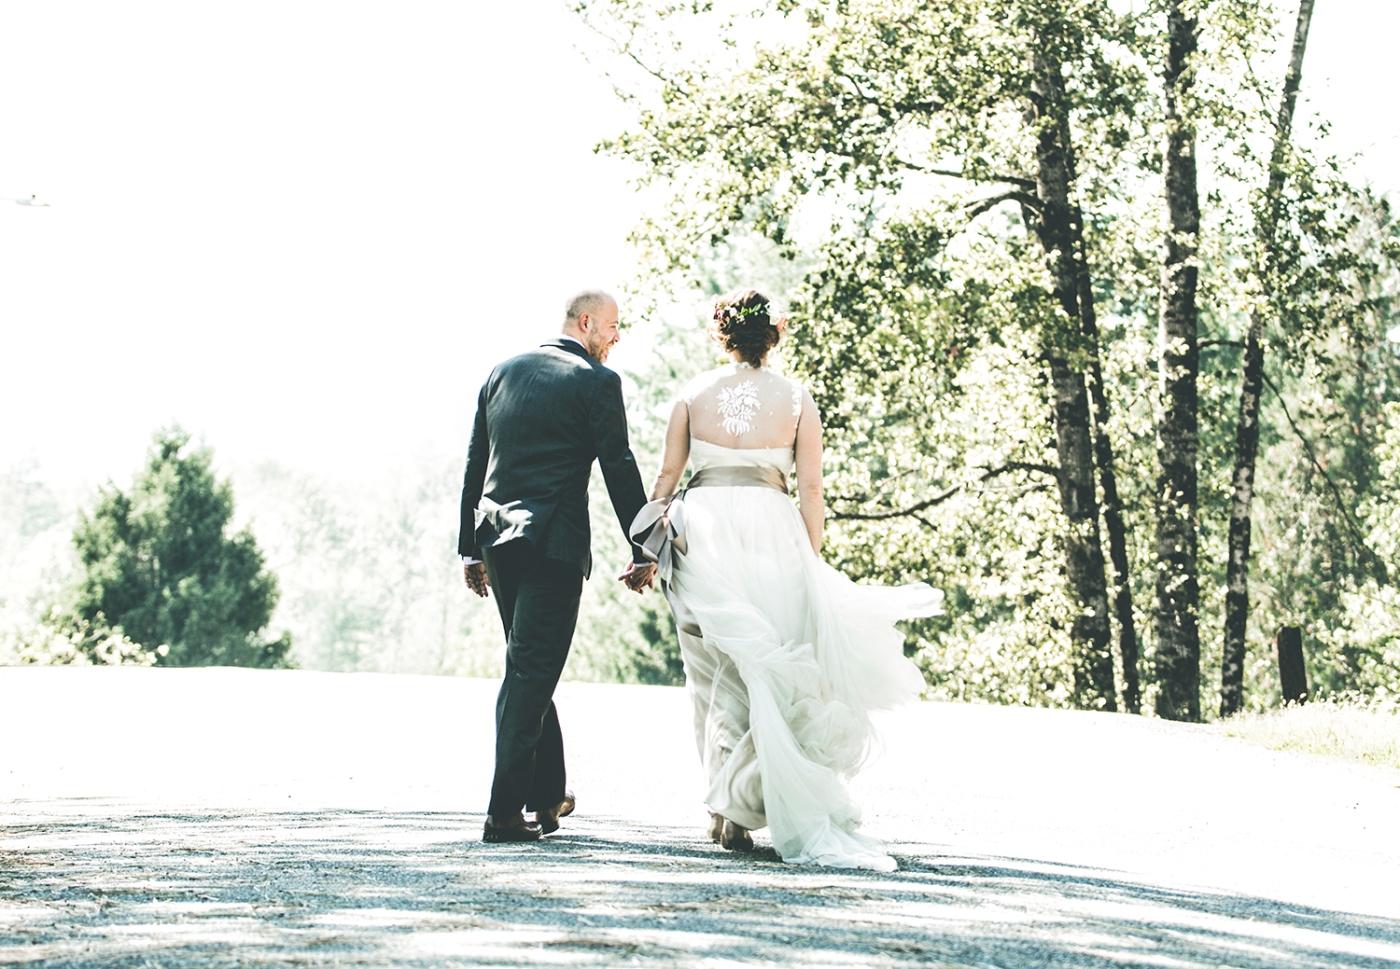 M&R River House Italian Wedding 2015DSC_4018